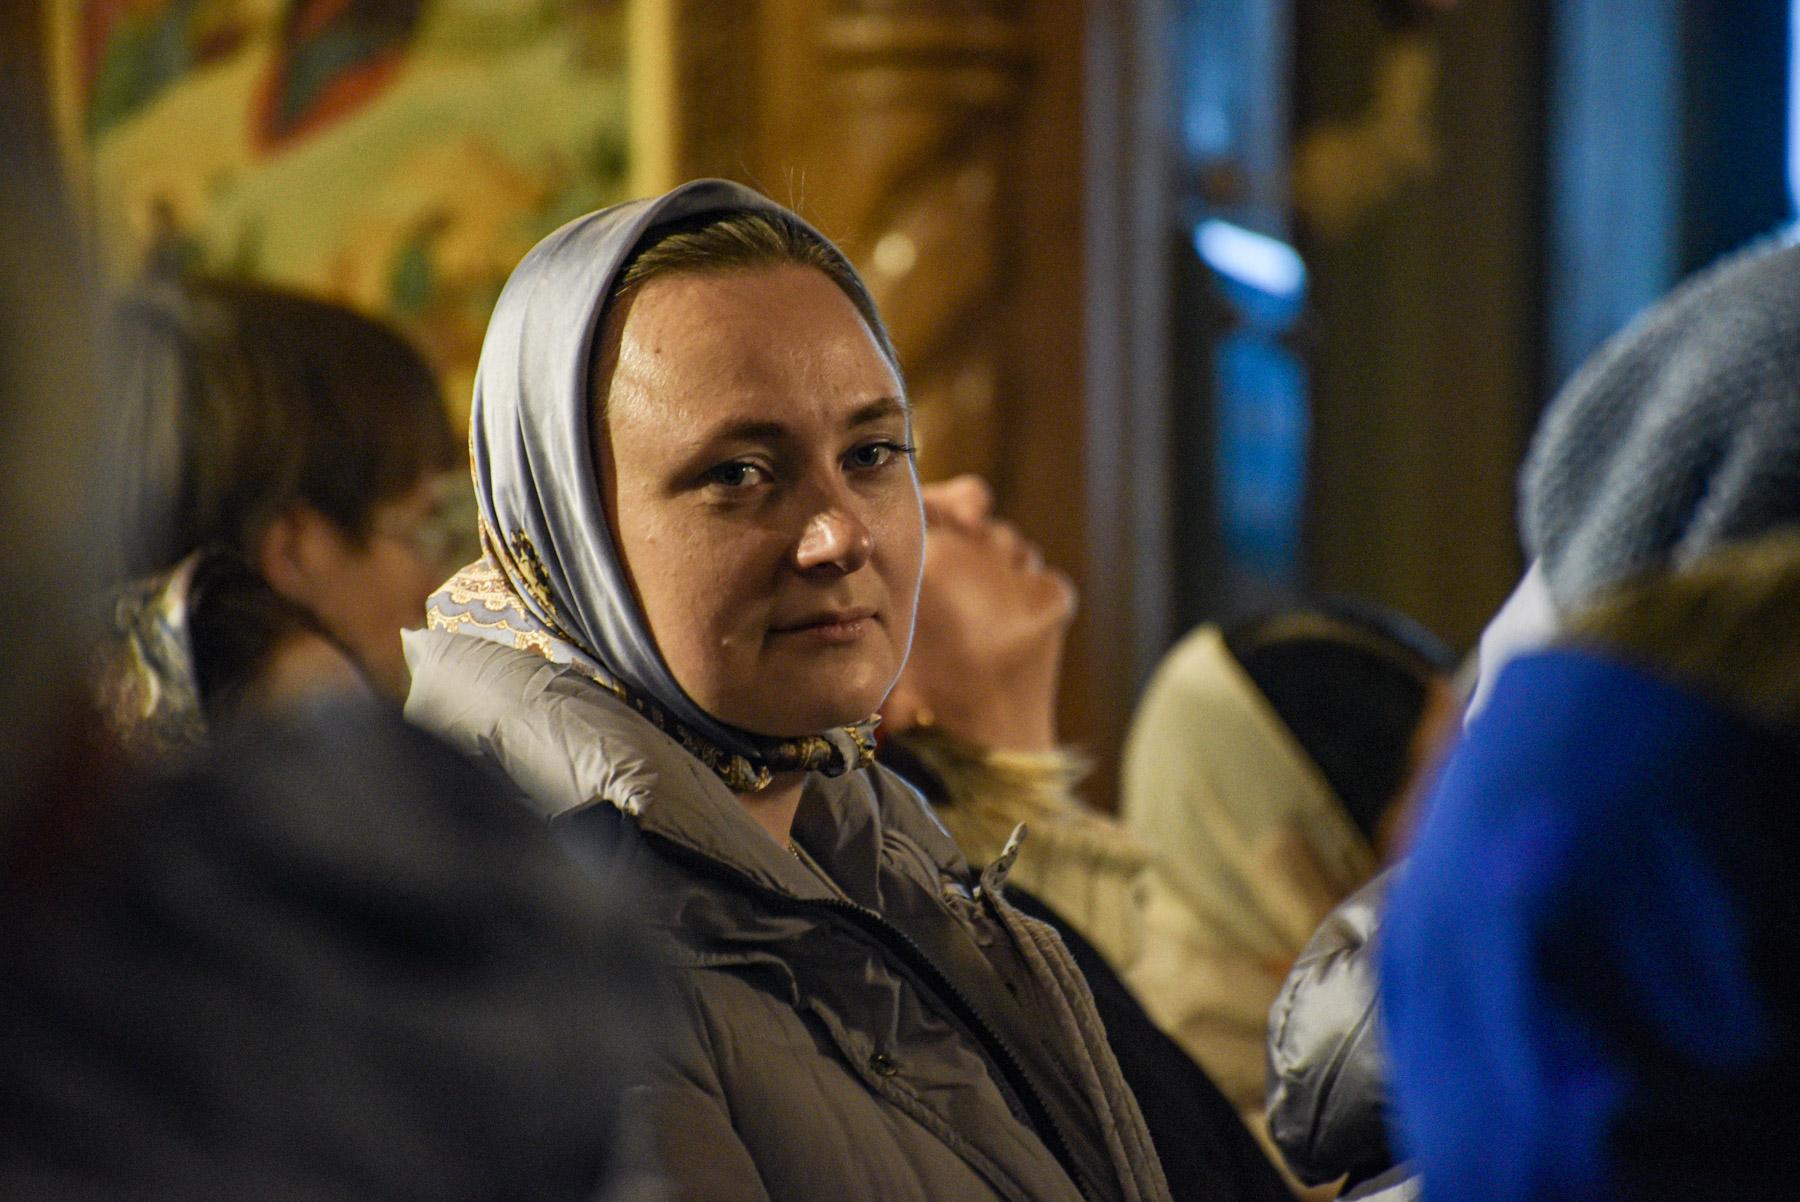 photos of orthodox christmas 0239 2